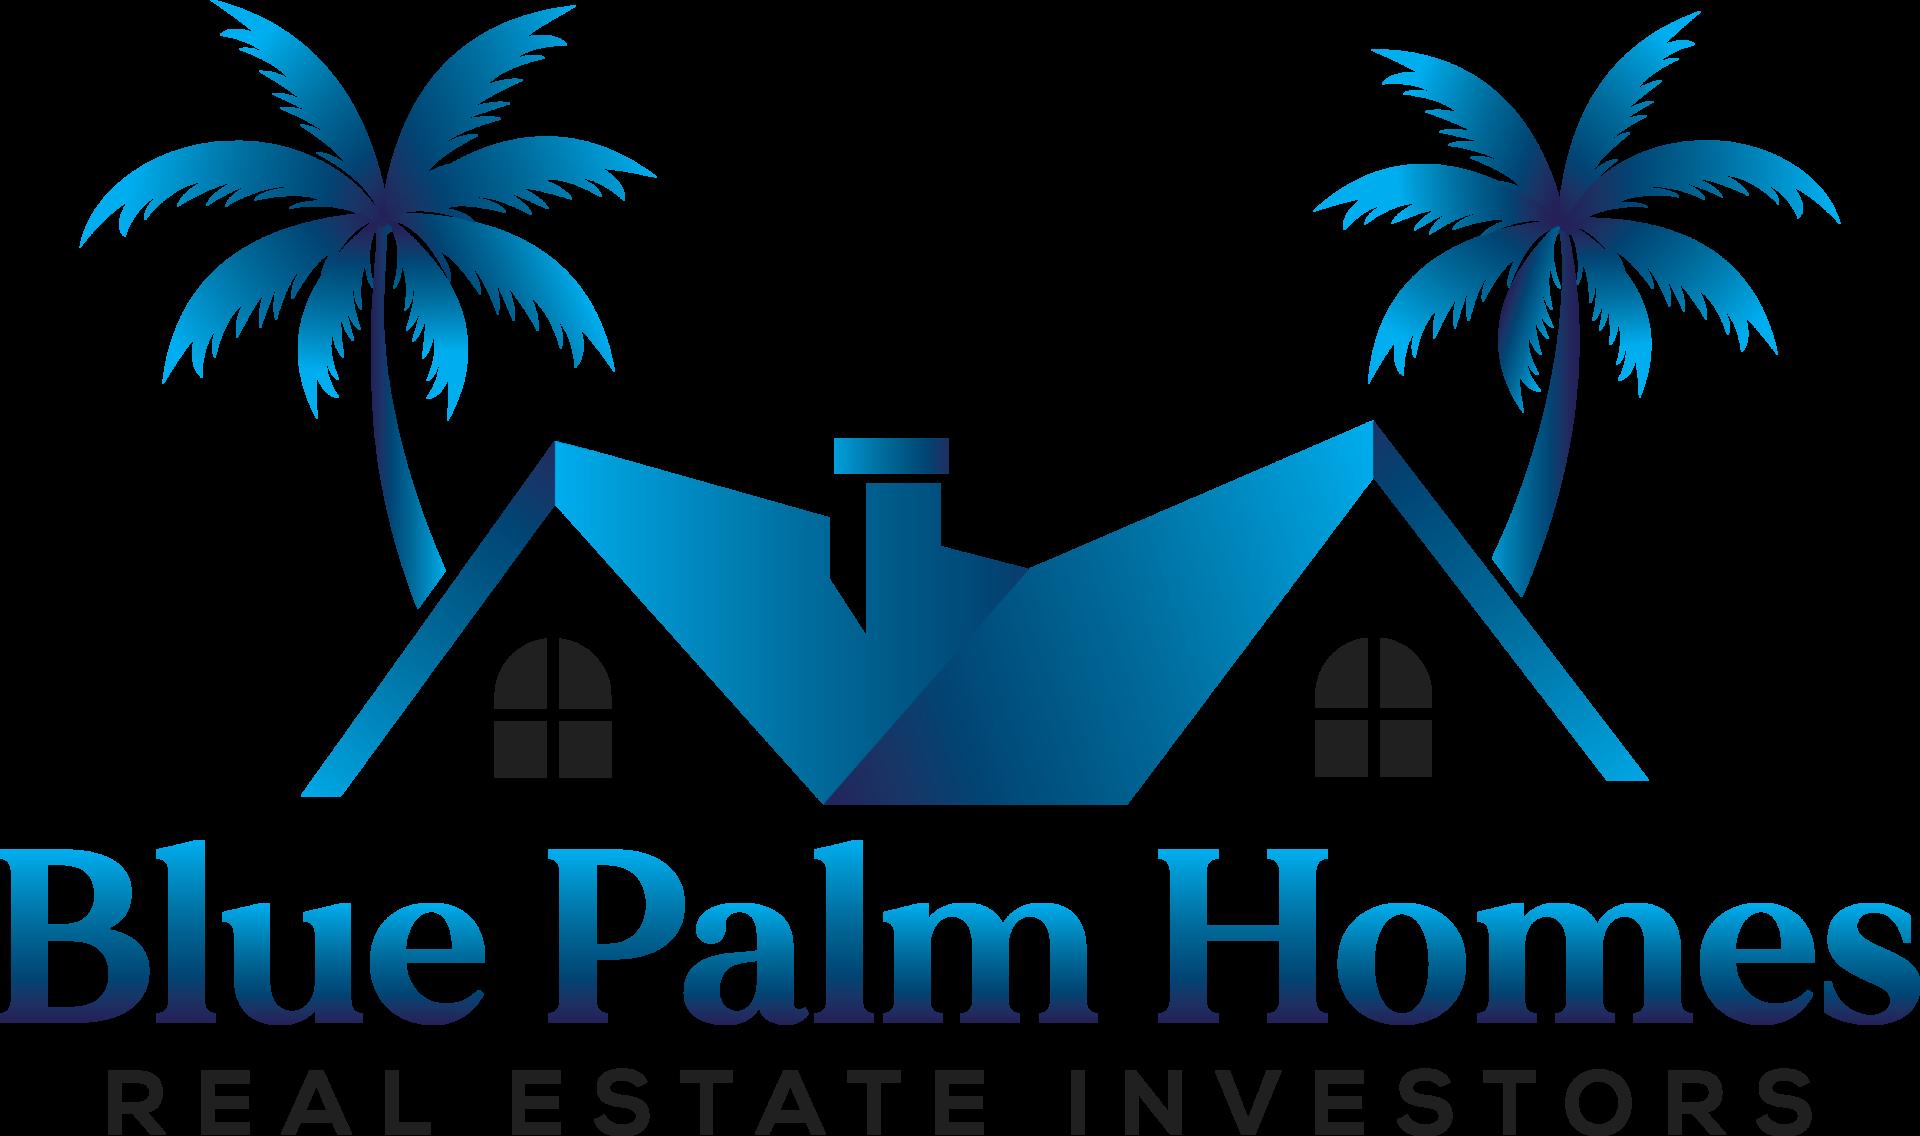 Blue Palm Homes Main logo